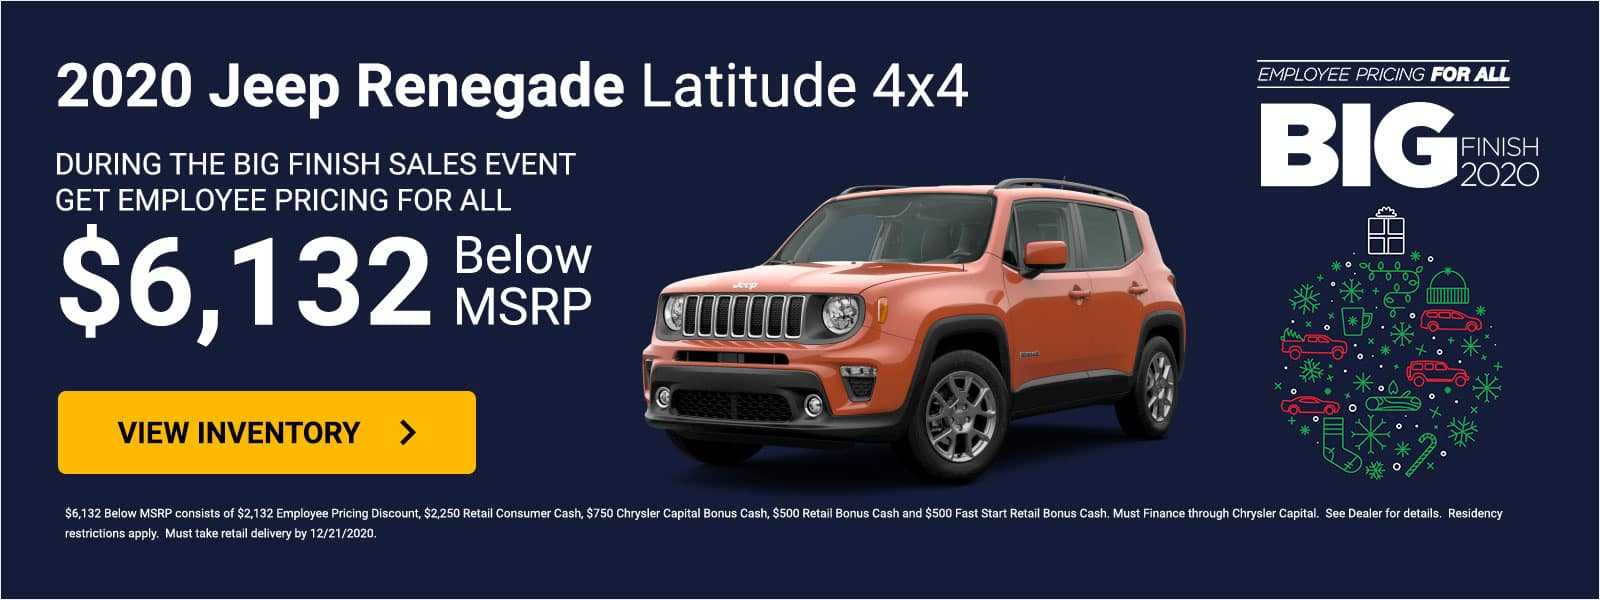 MABC_Banners_1600x600_2020-12_509913_20-Jeep-Renegade-1